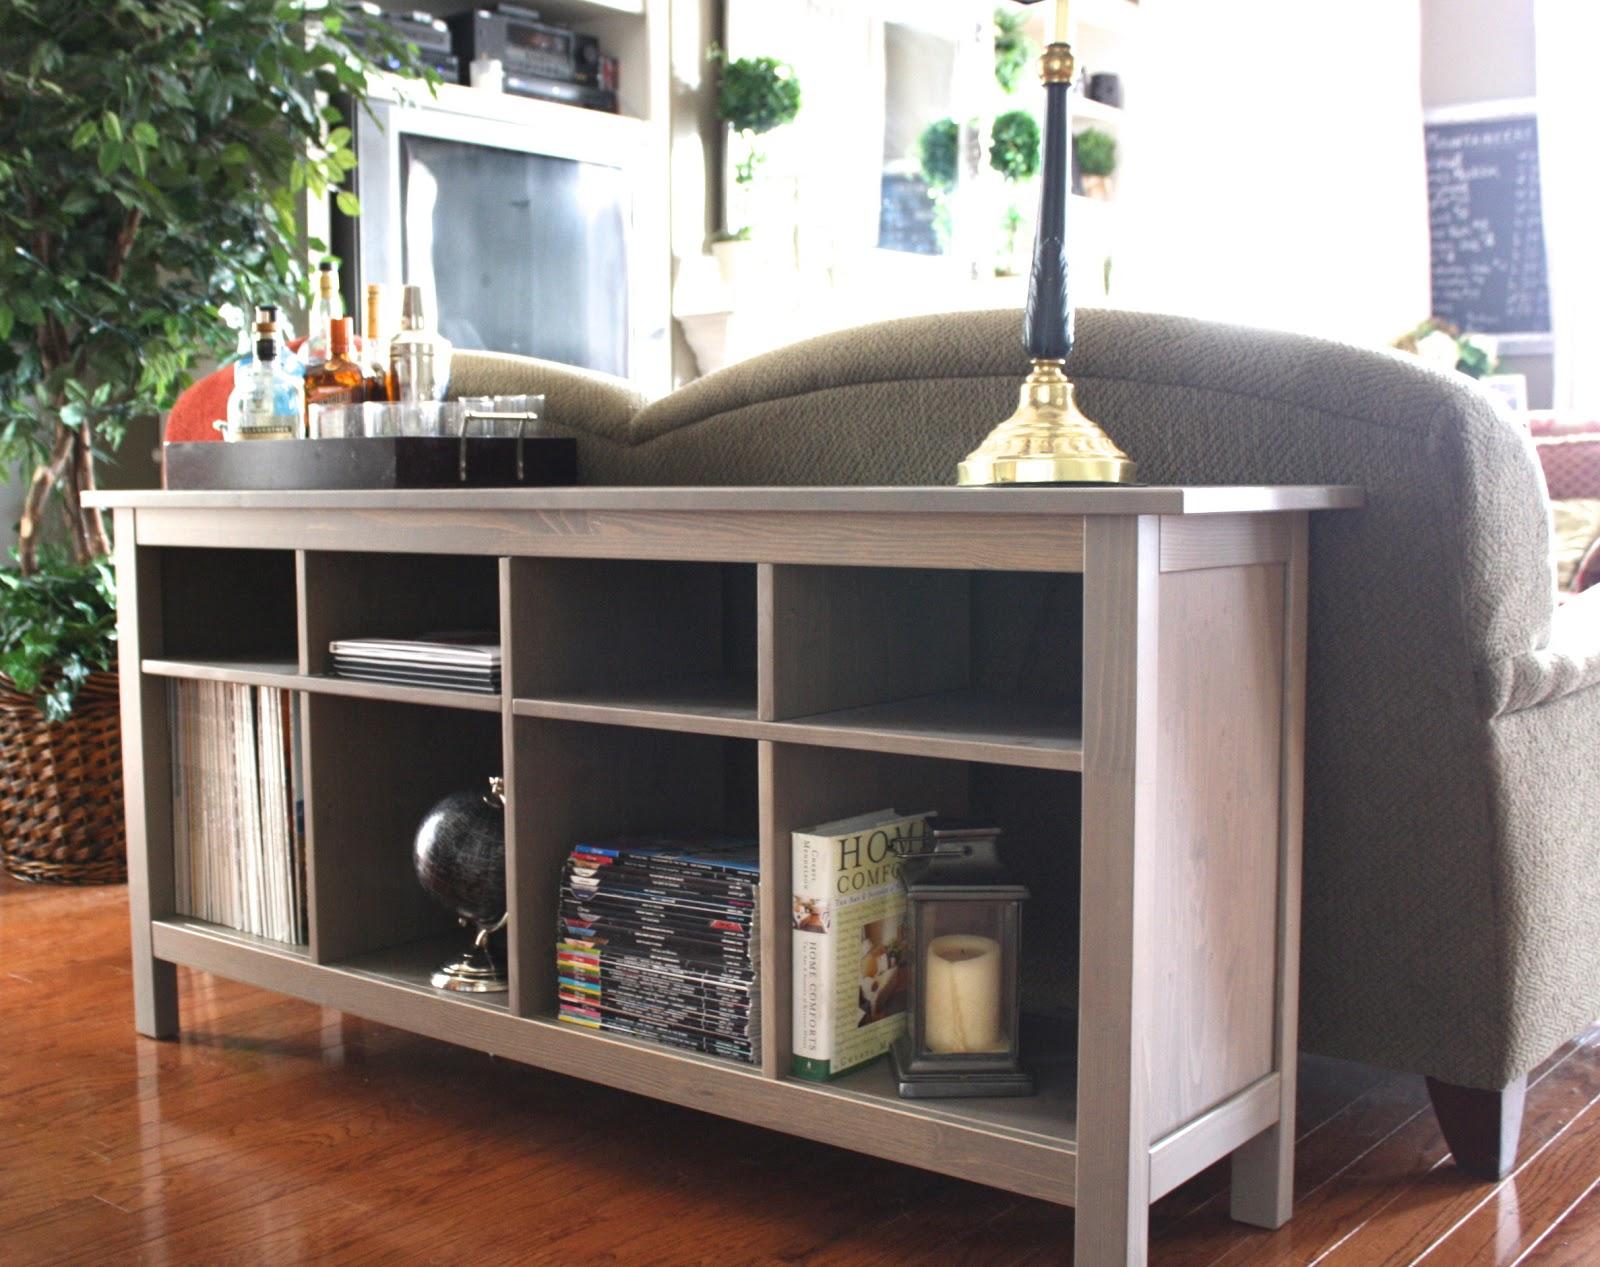 Foyer Table Craigslist : Craigslist sofa table console project